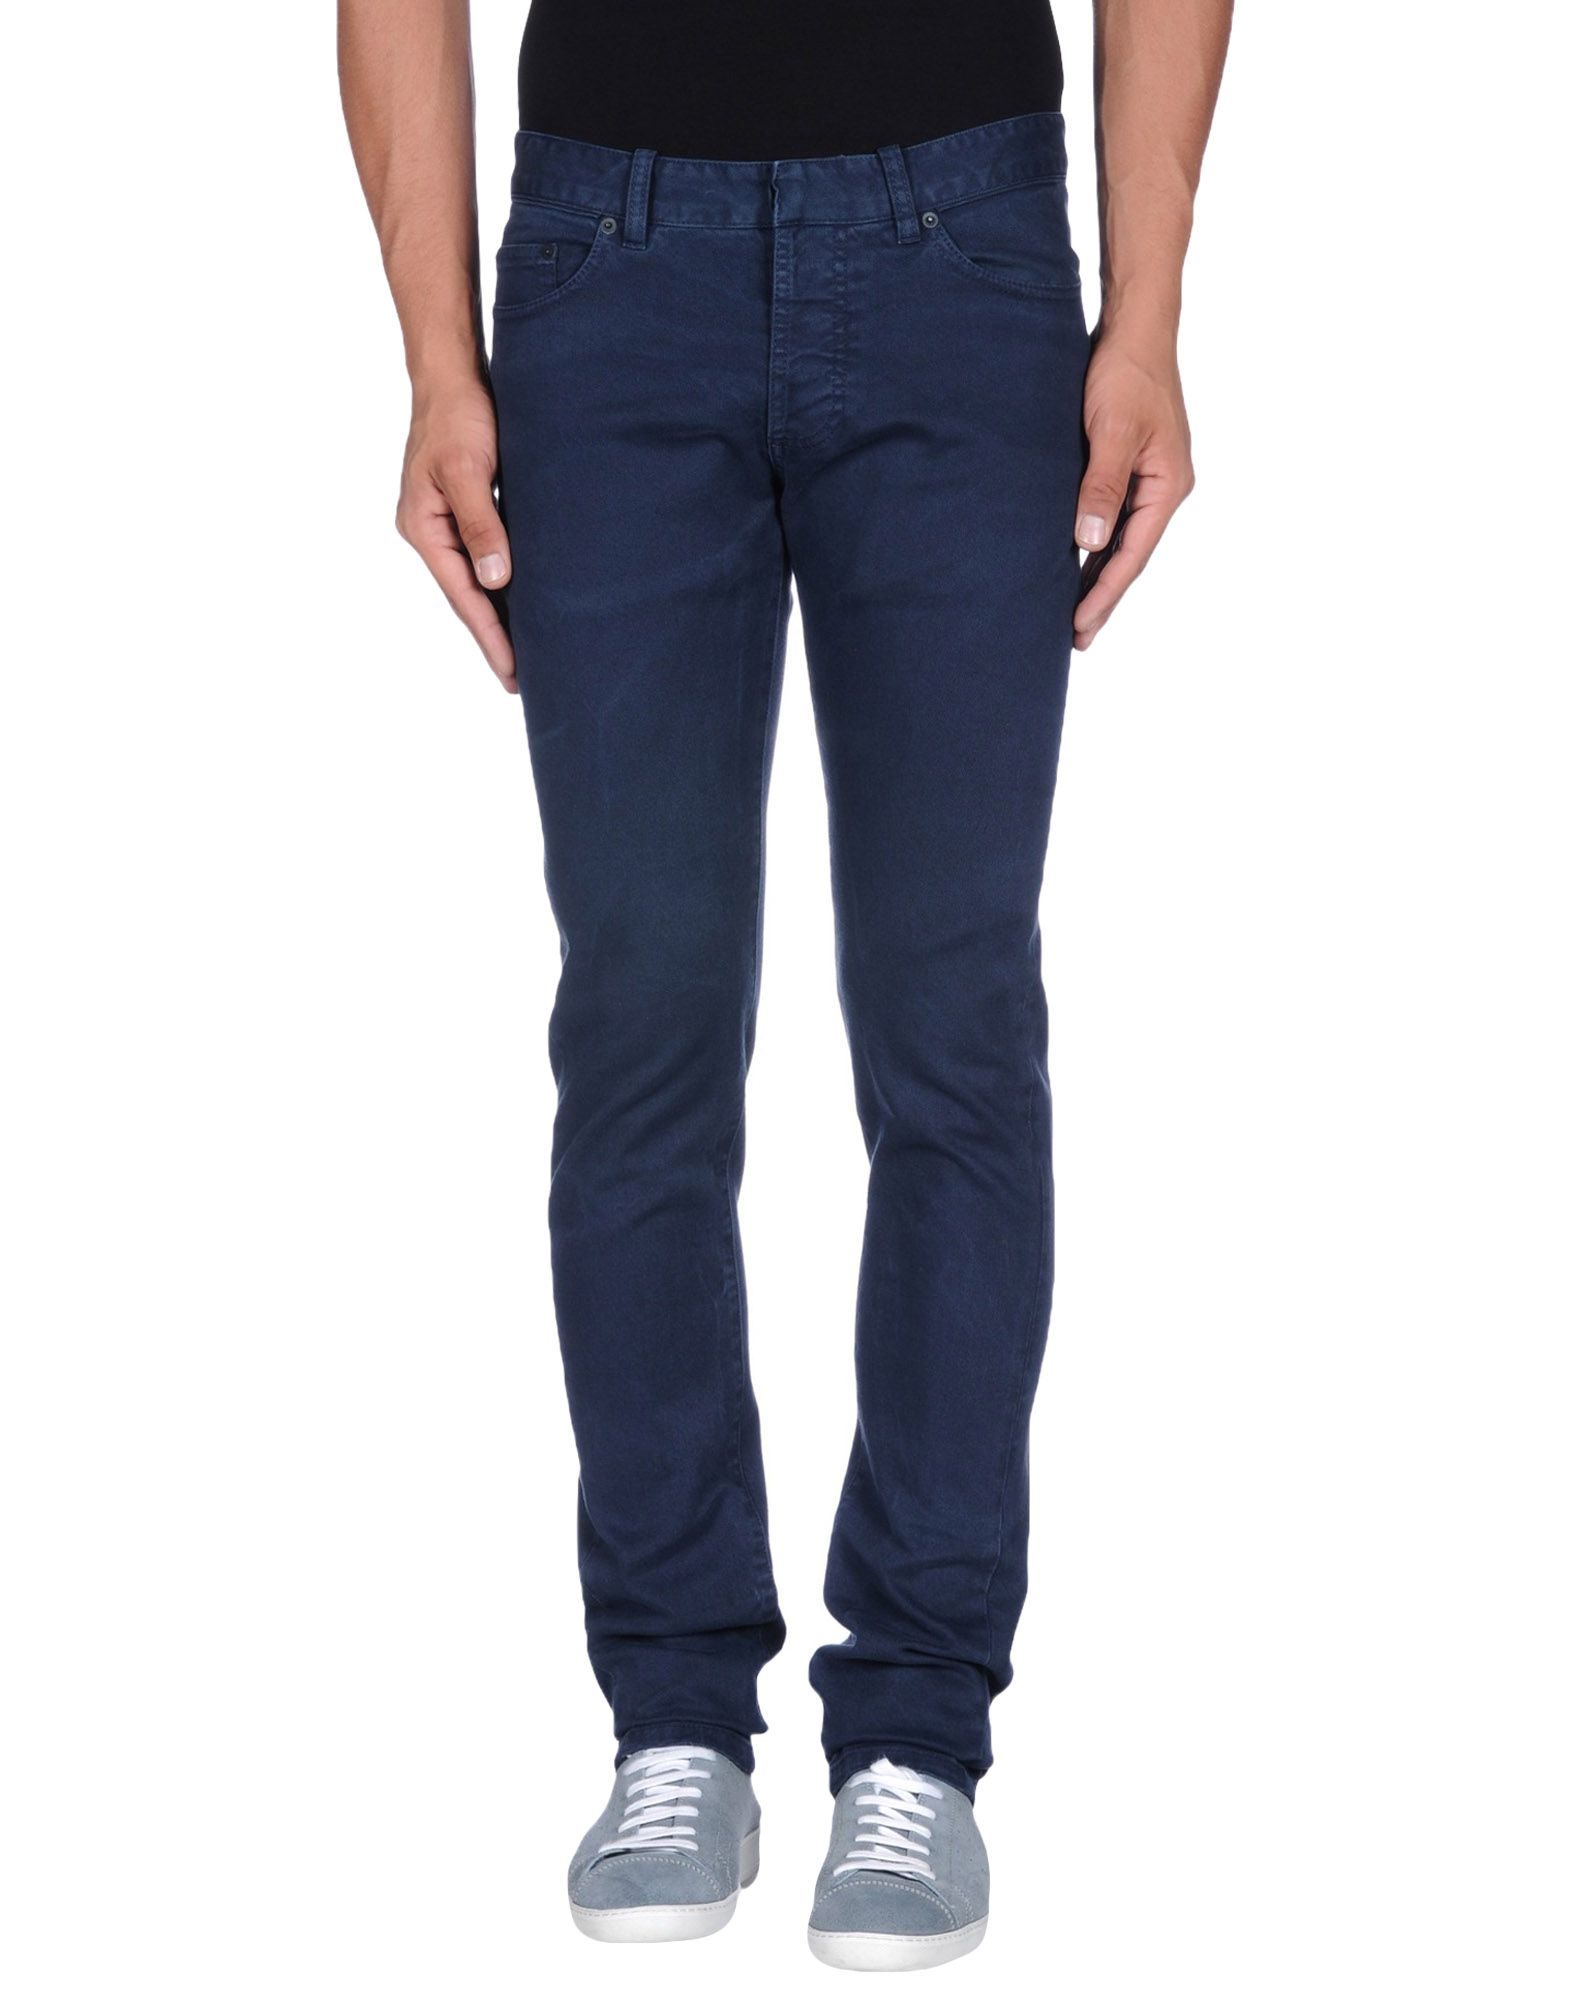 Balenciaga Denim Trousers in Dark Blue (Blue) for Men